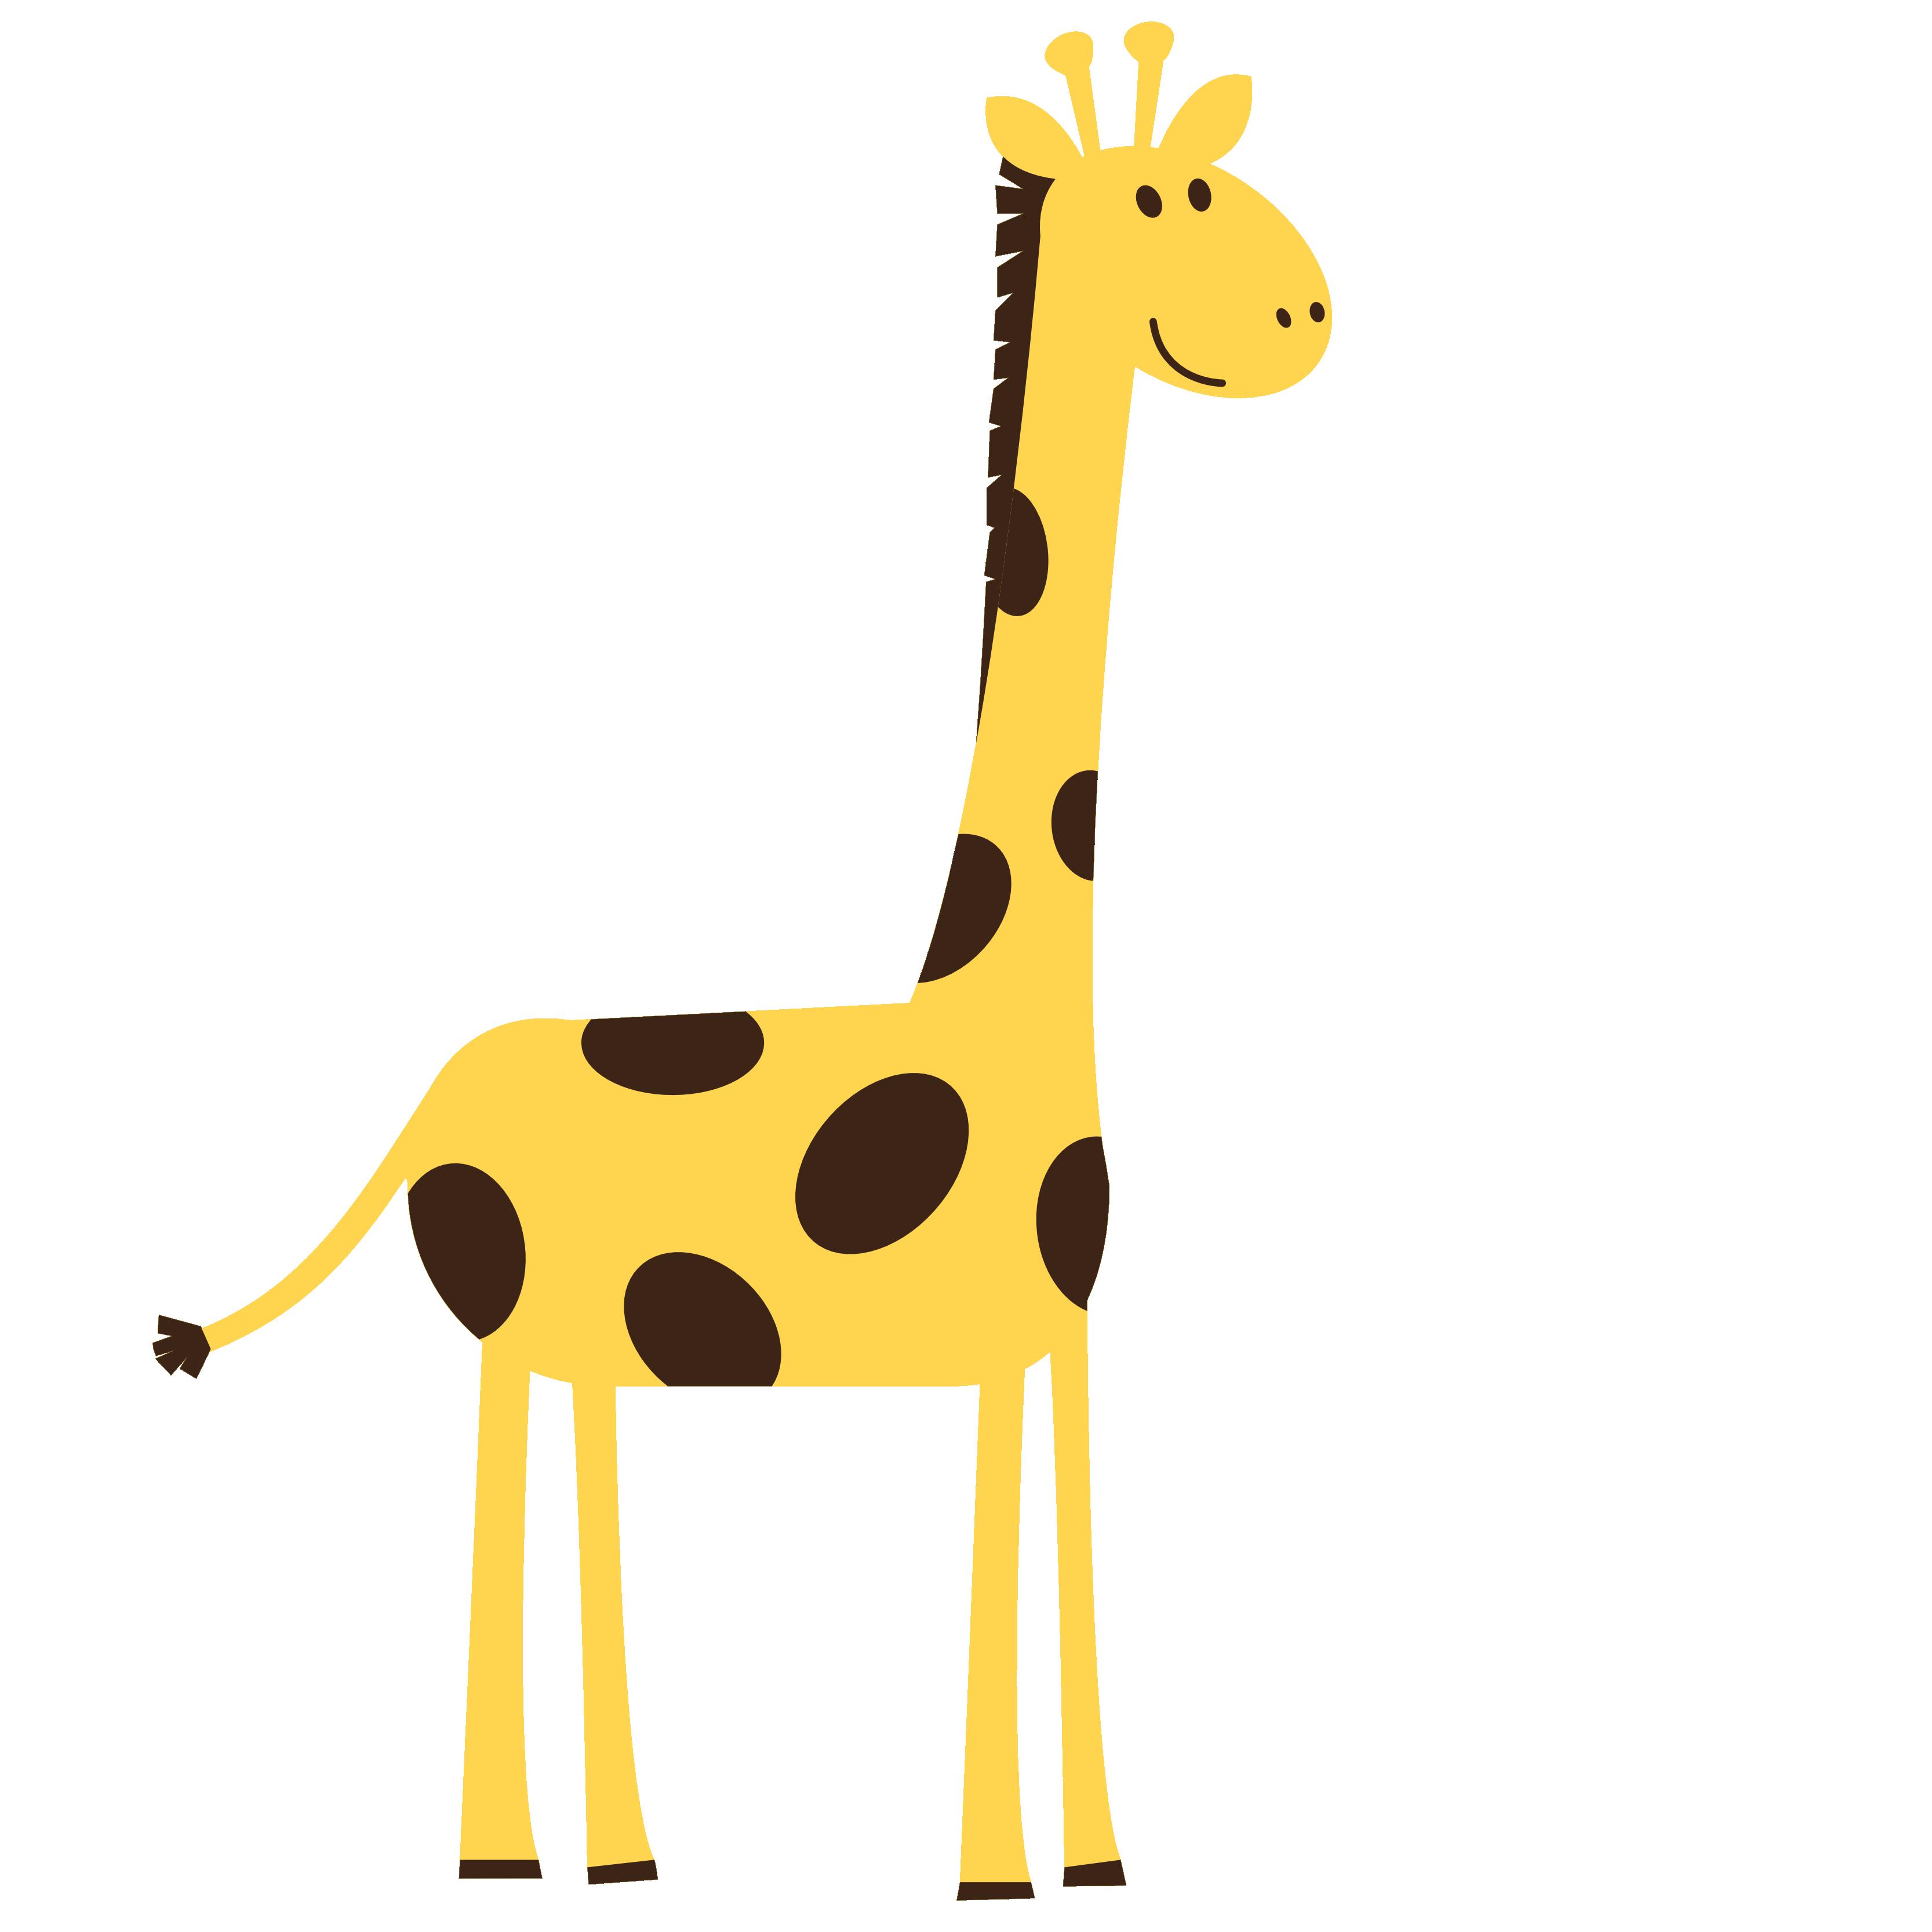 banner royalty free download  kids birthday branding. Neck clipart giraffe.